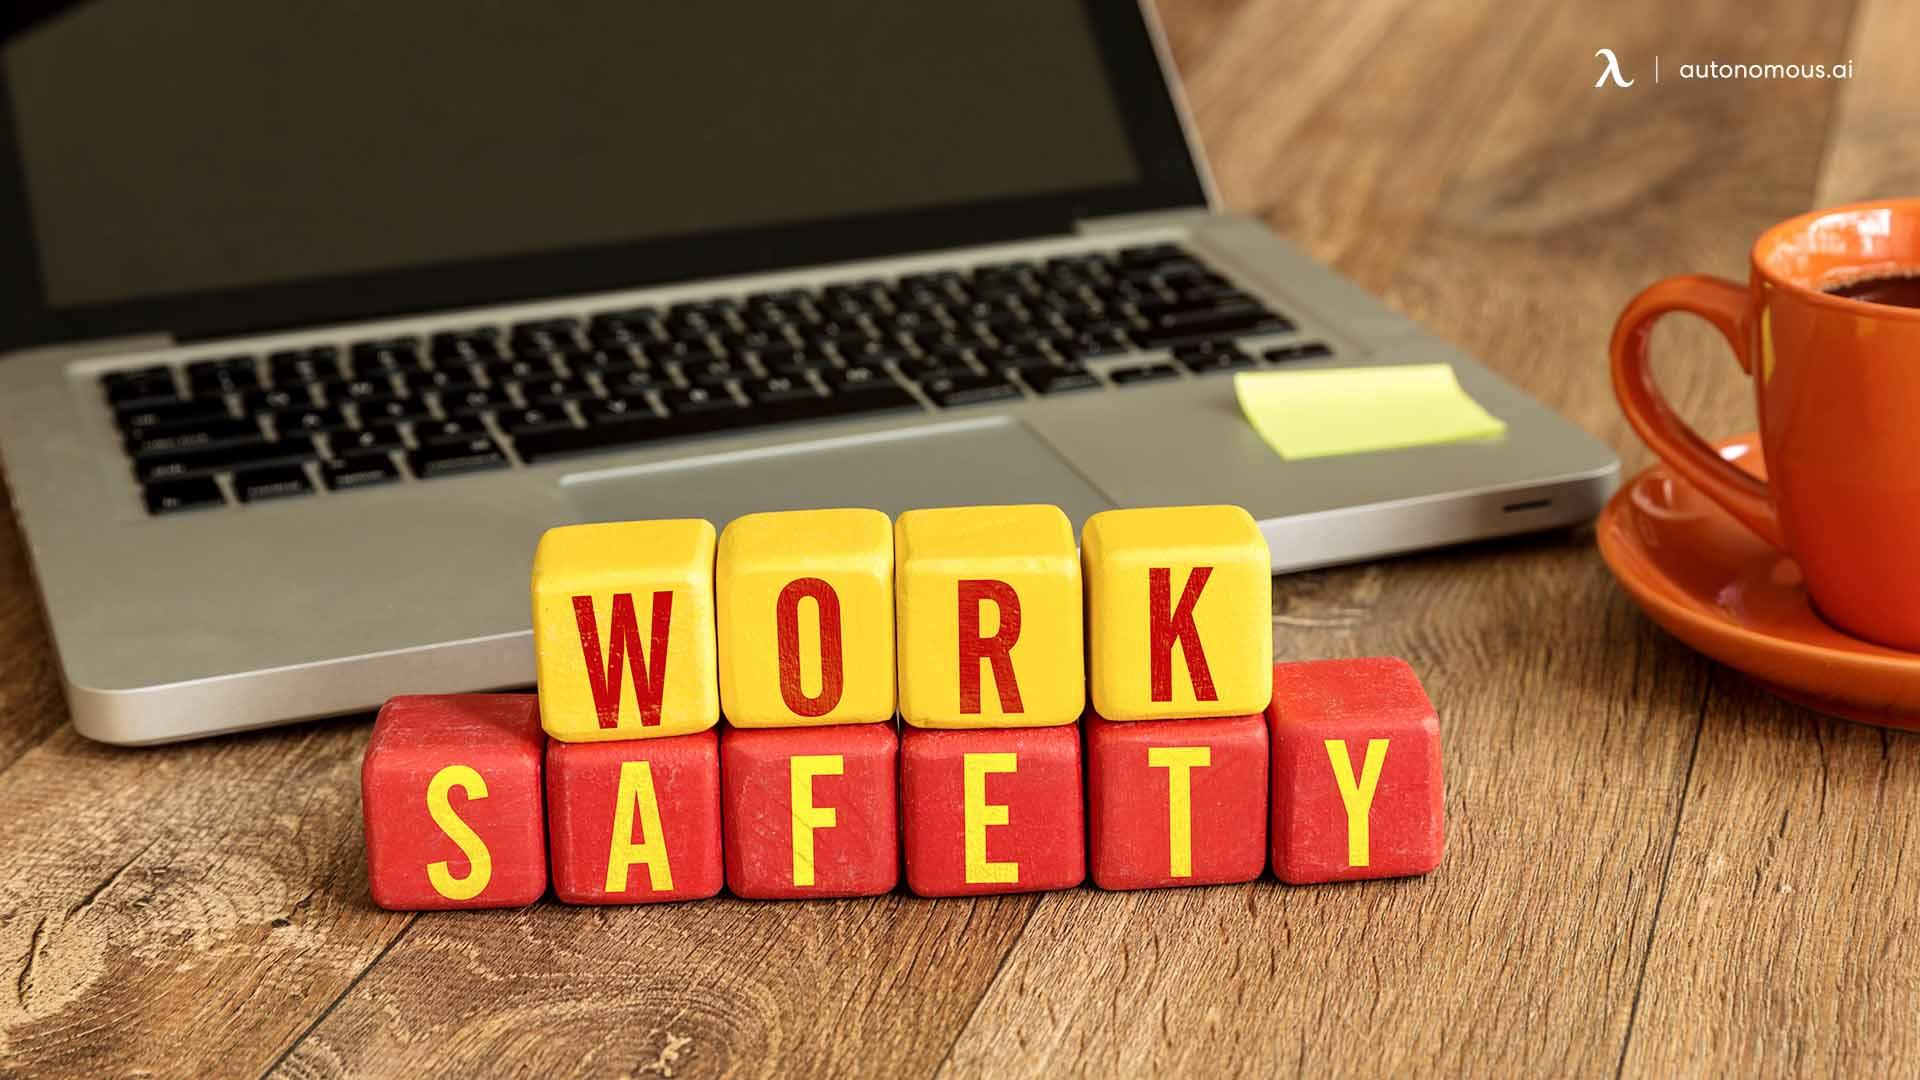 Establish better safety policies